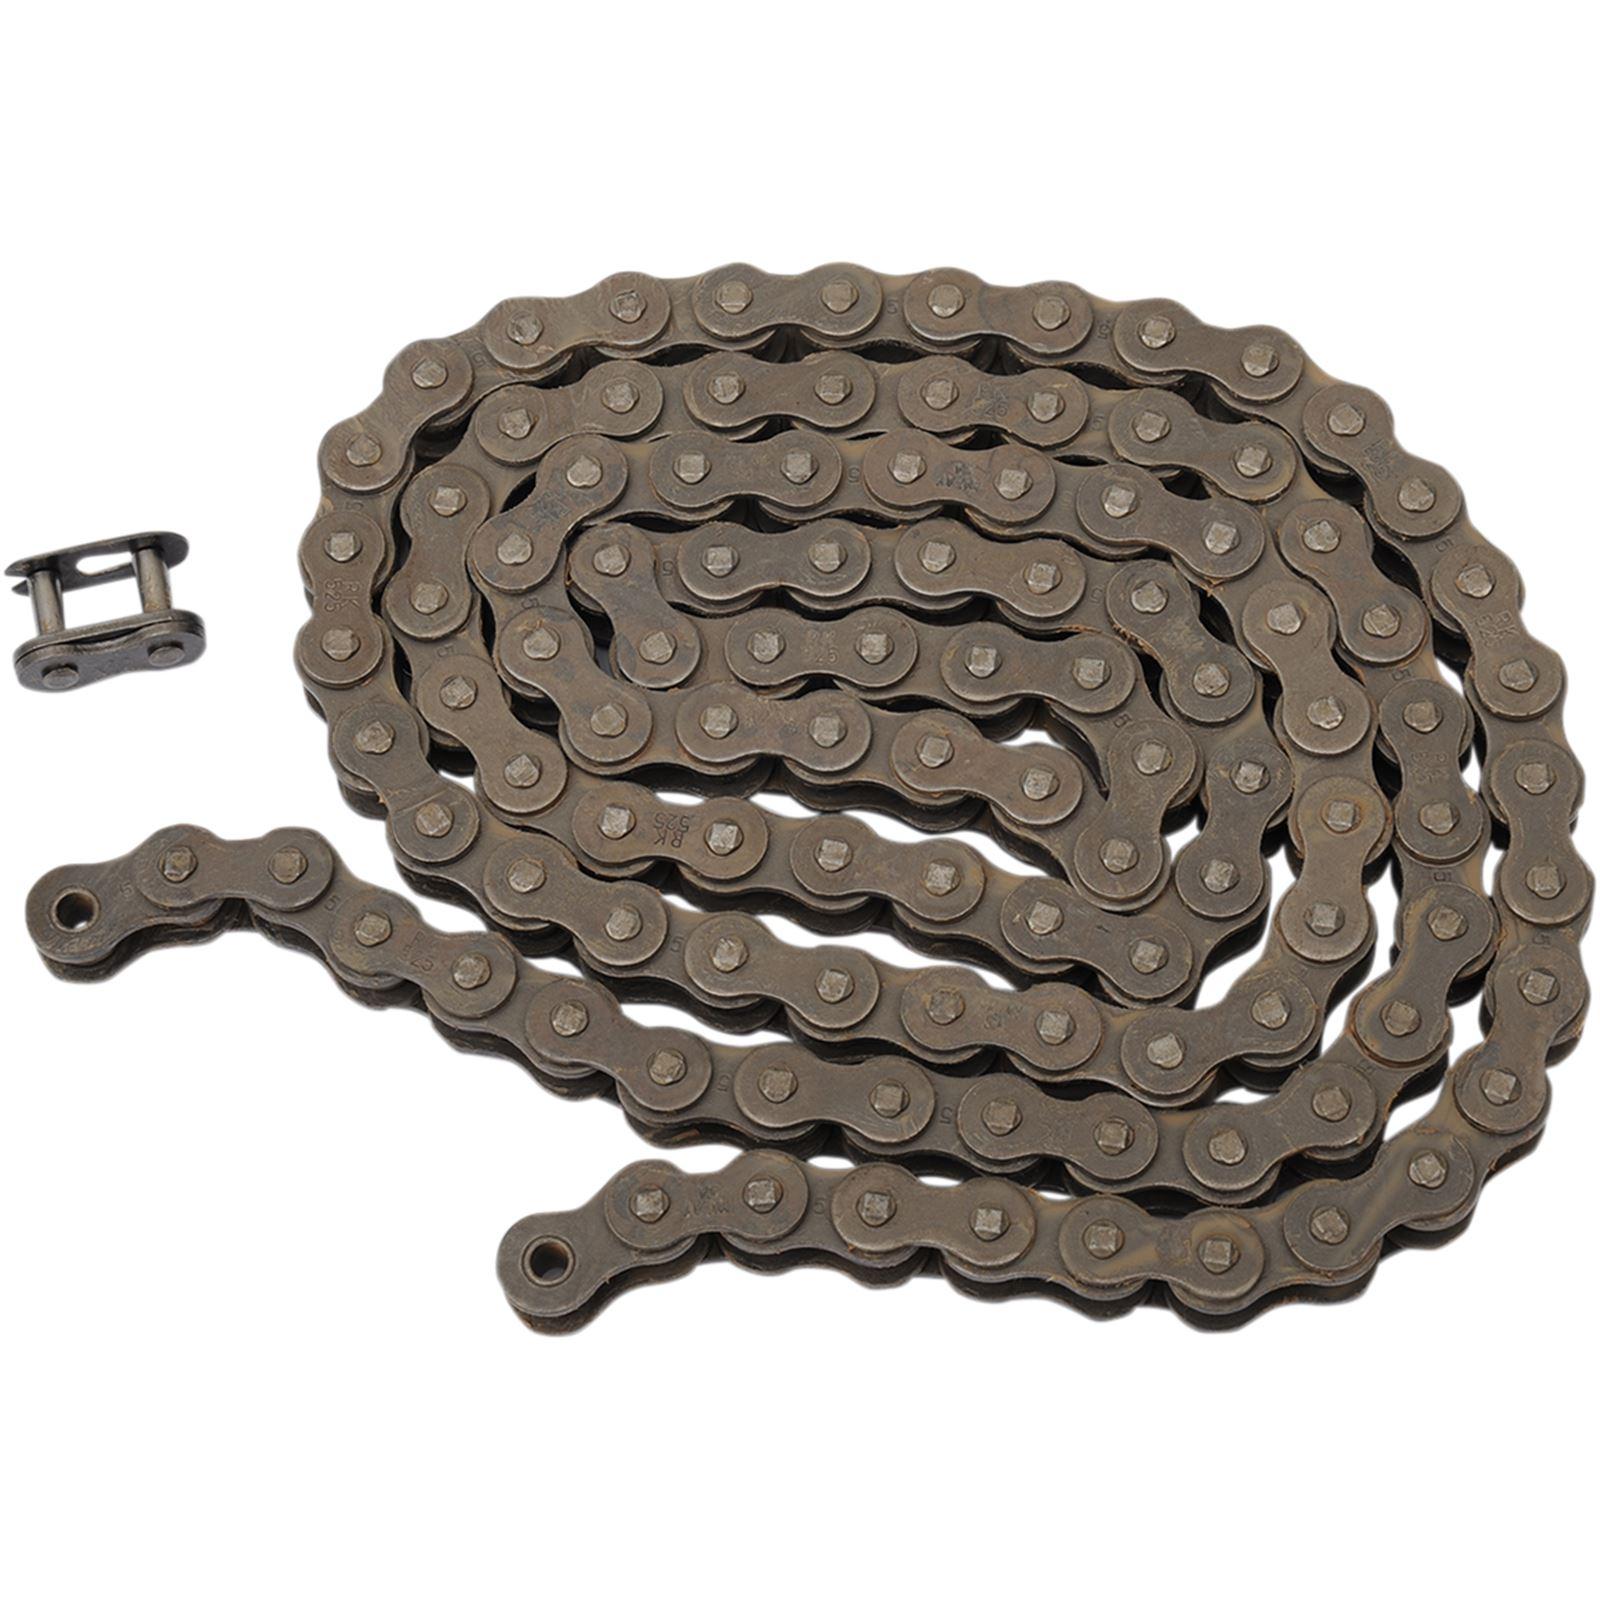 RK Excel M525 - Standard Chain - 110 Links